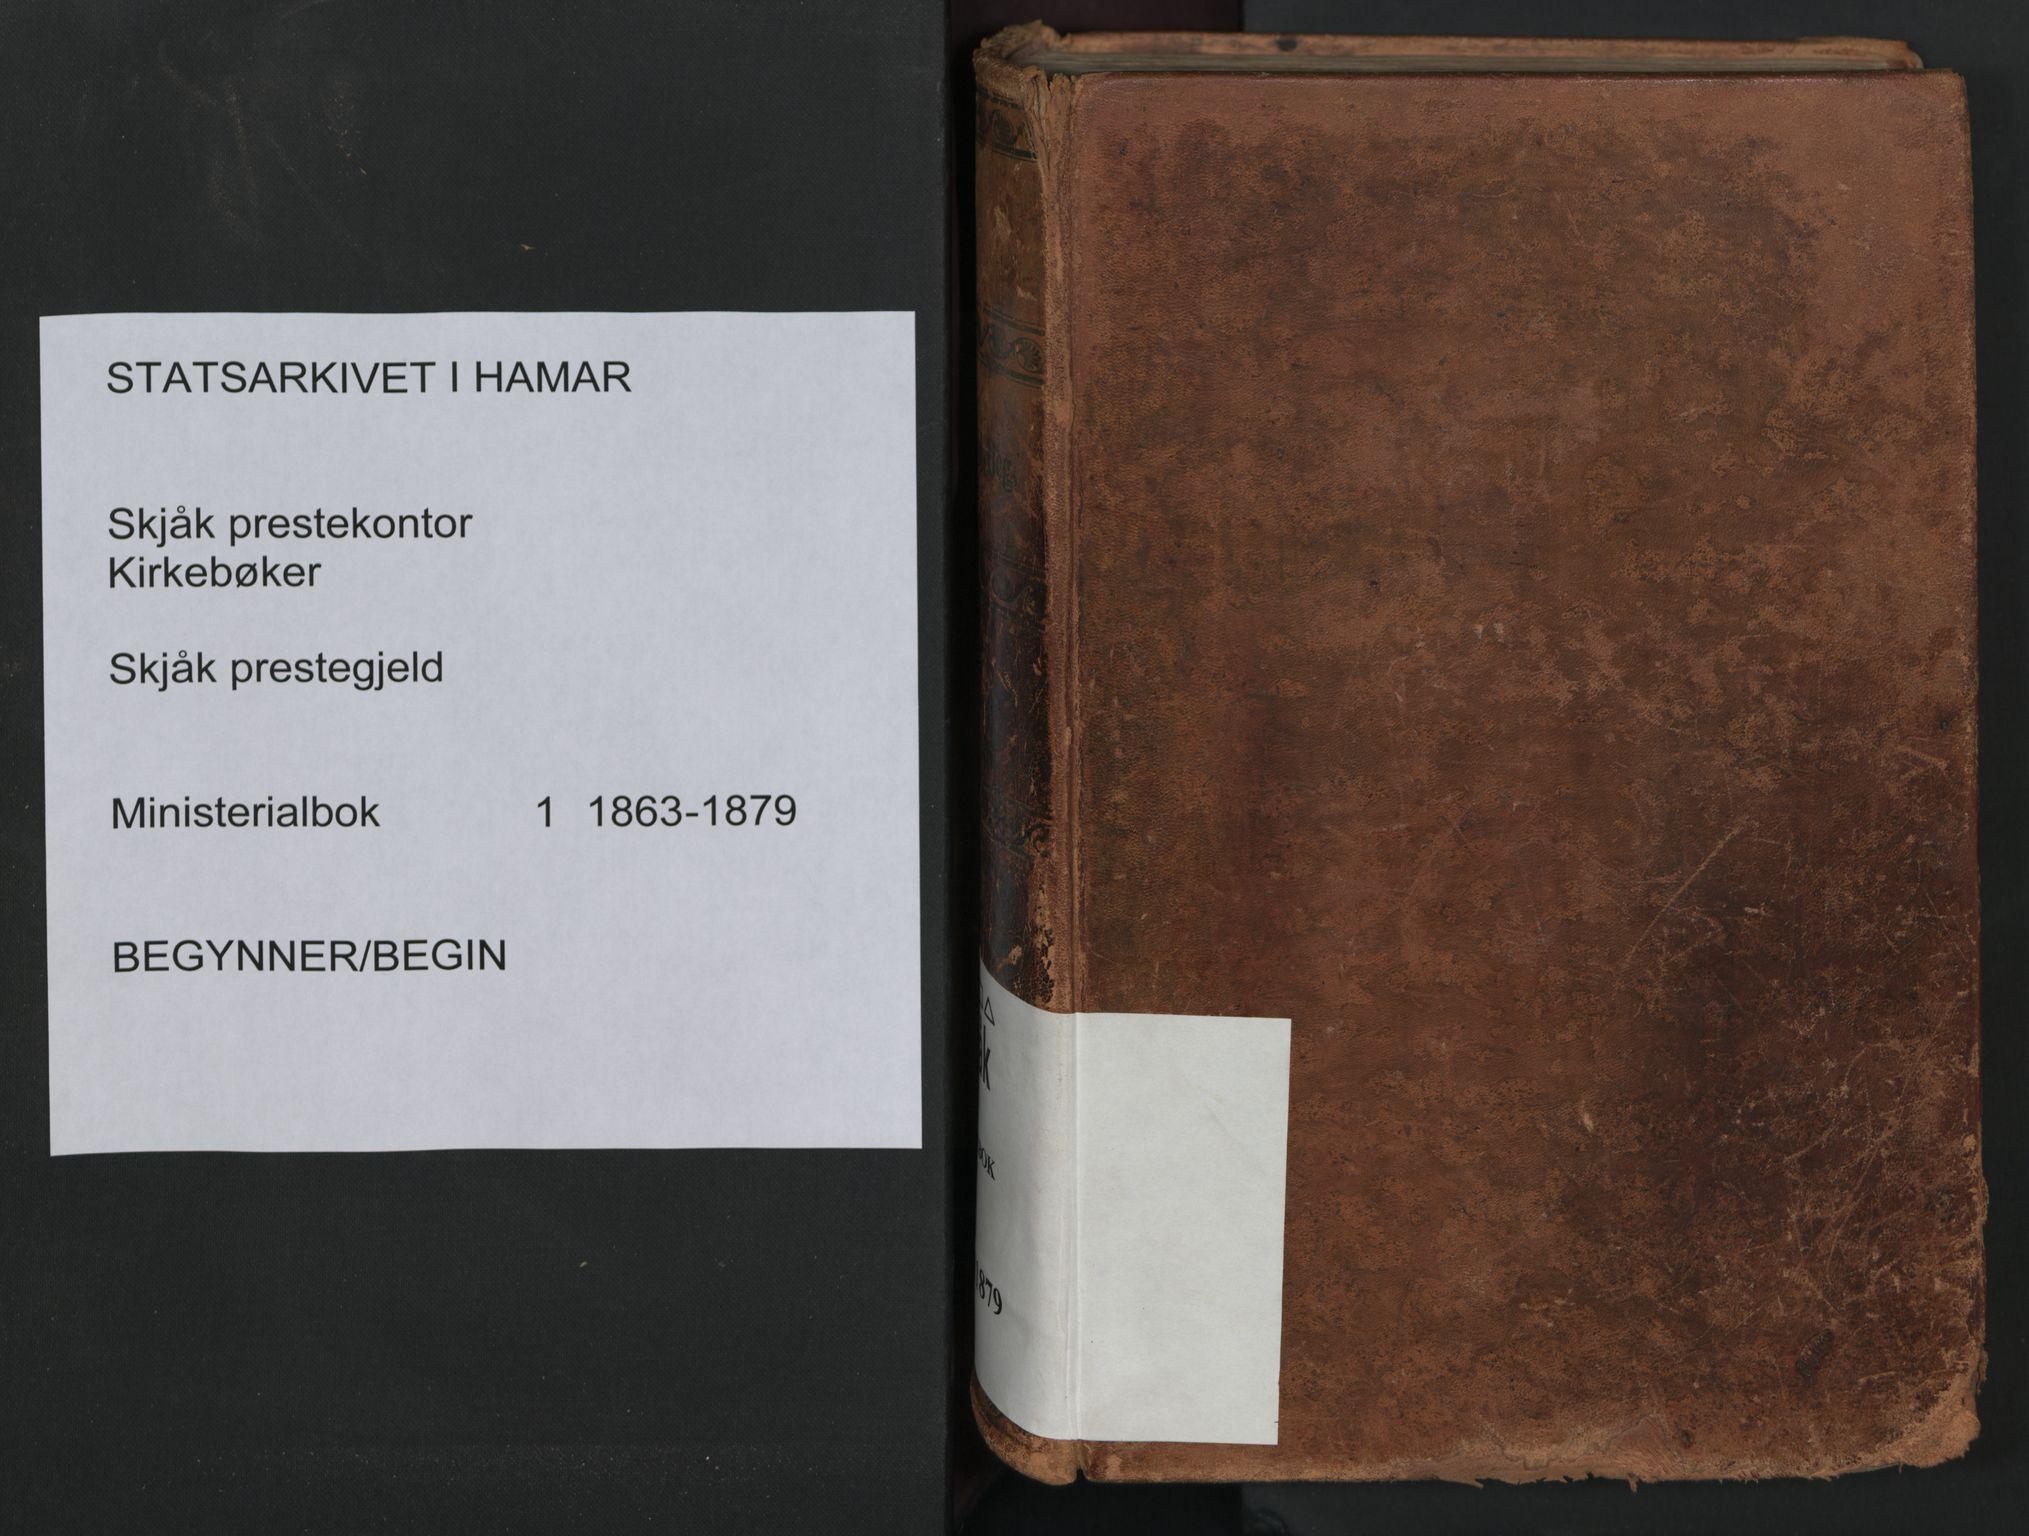 SAH, Skjåk prestekontor, Ministerialbok nr. 1, 1863-1879